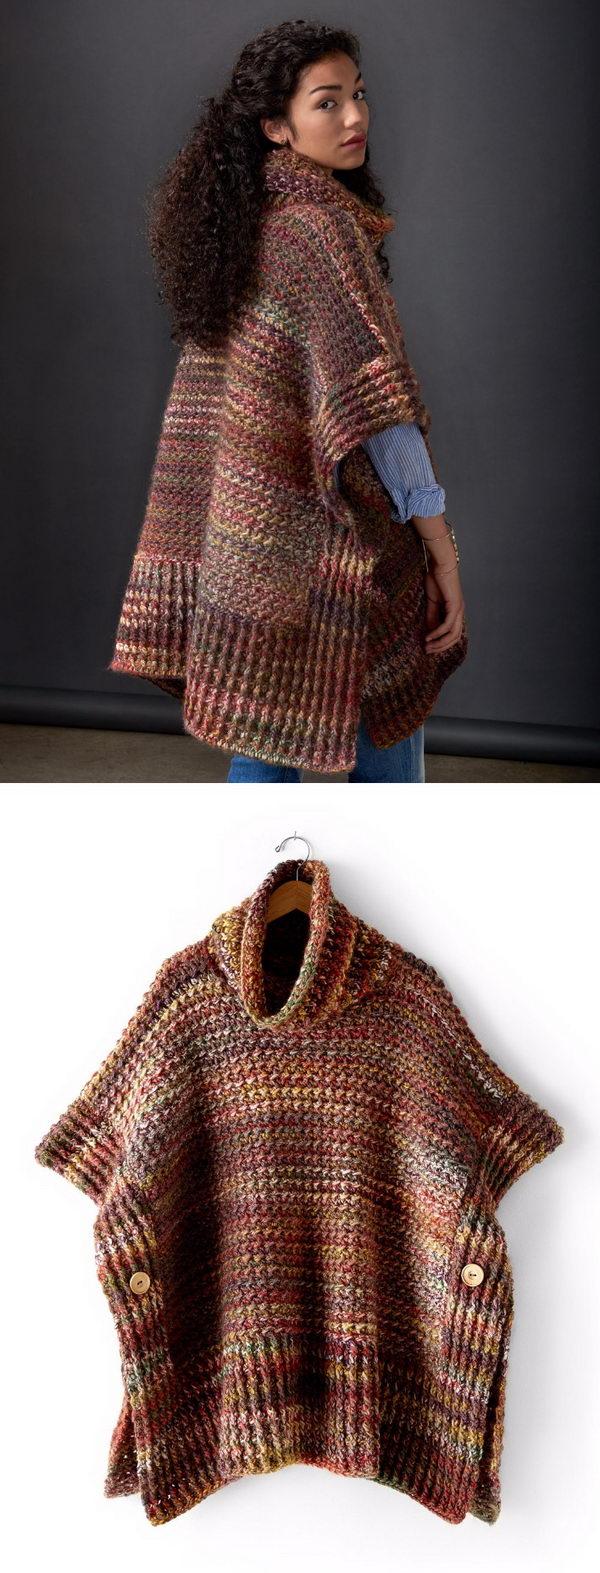 16 crochet women capes poncho ideas - 20 Crochet Women Capes and Poncho Ideas